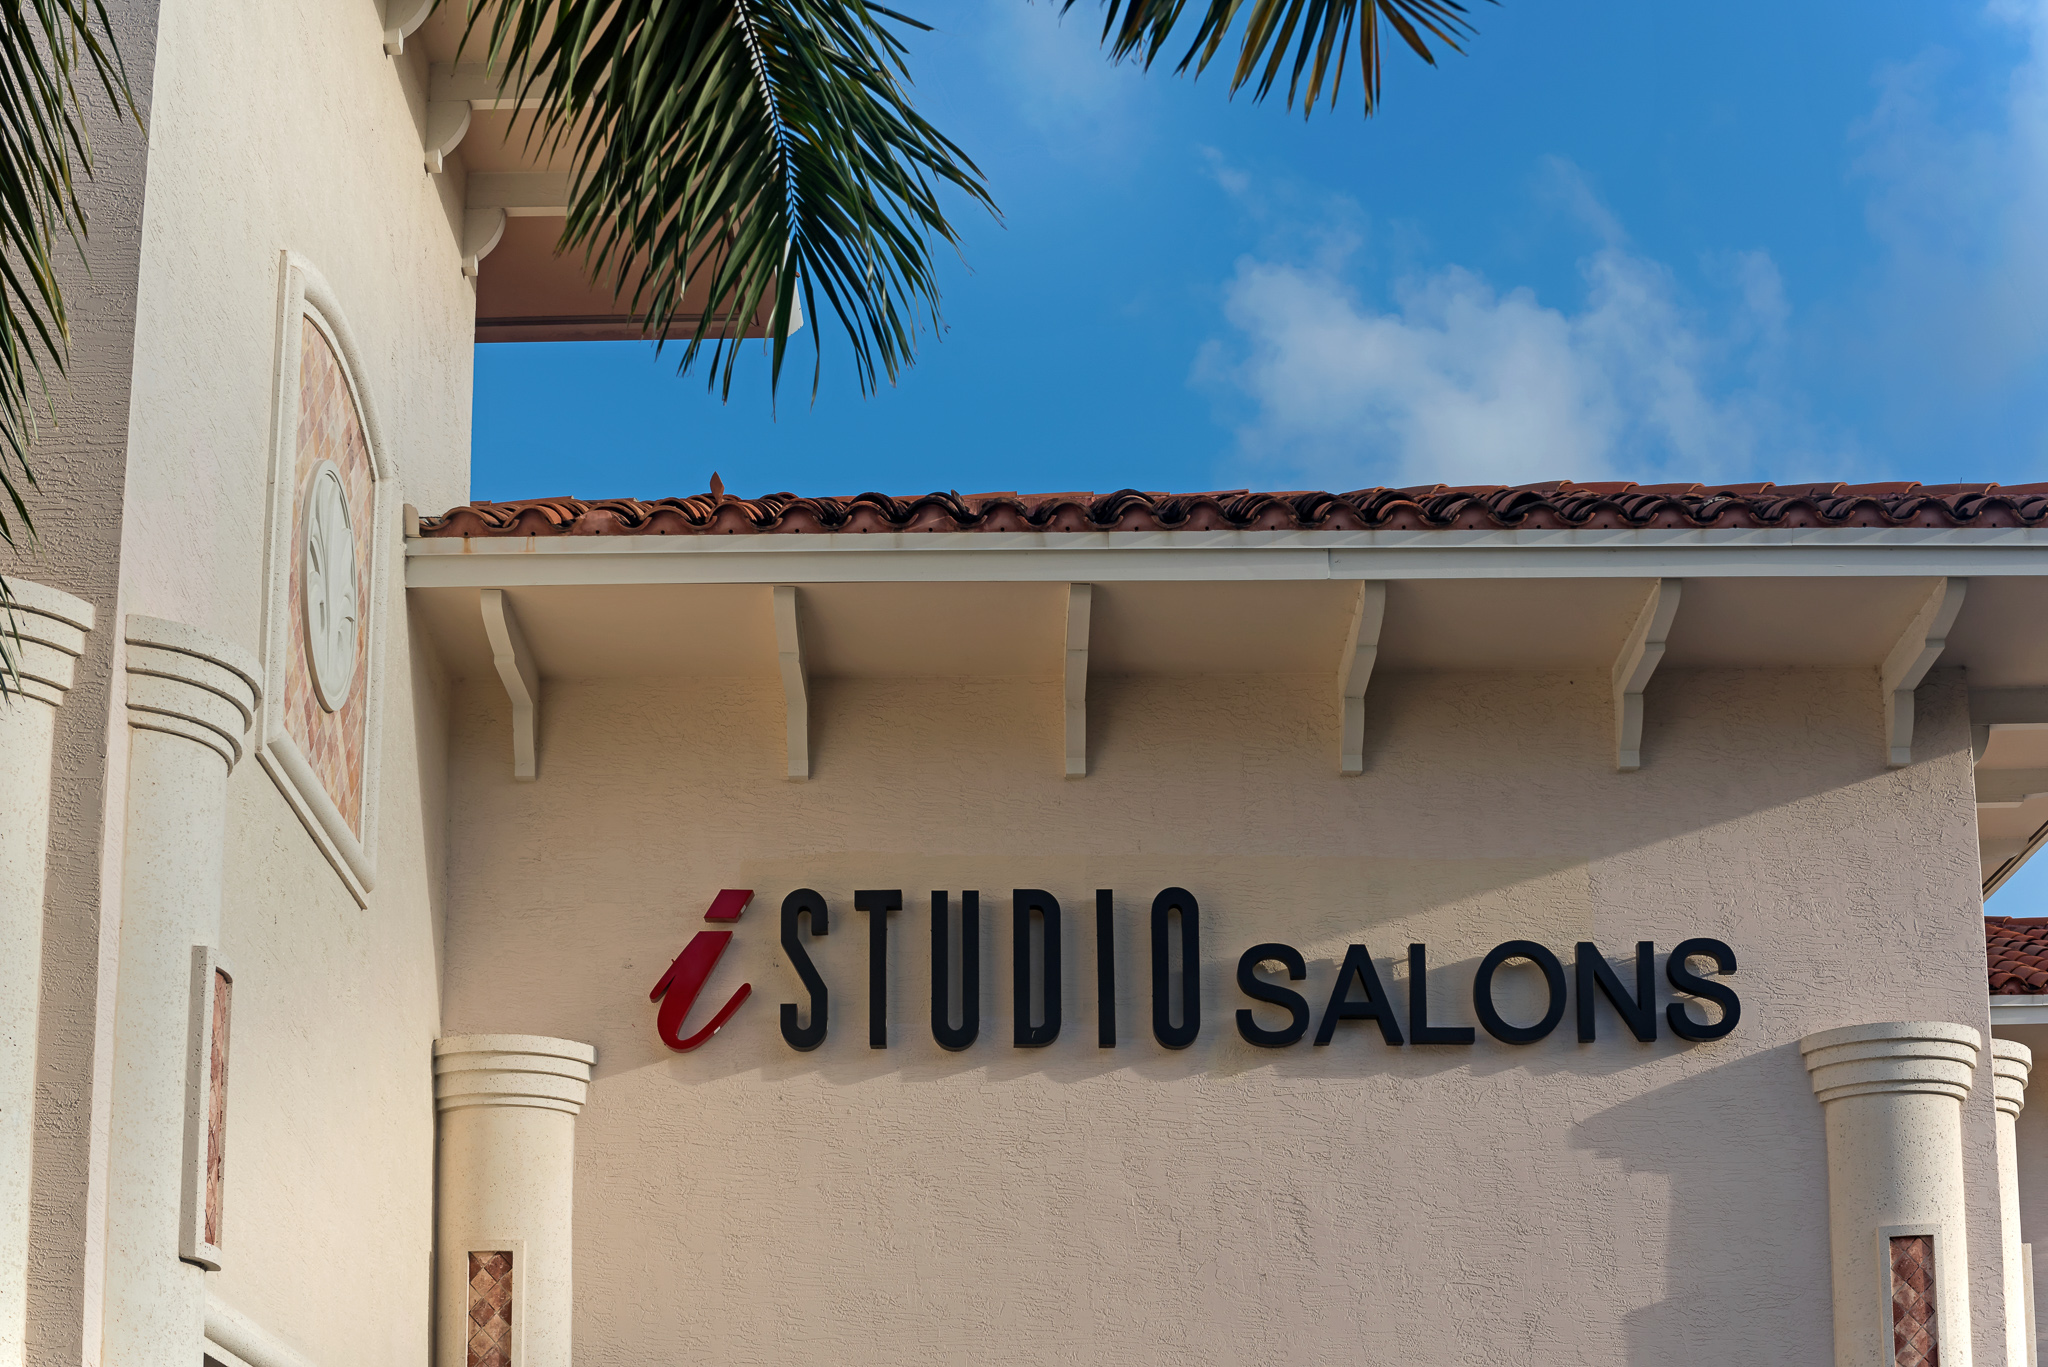 iStudio Salons Boca Raton